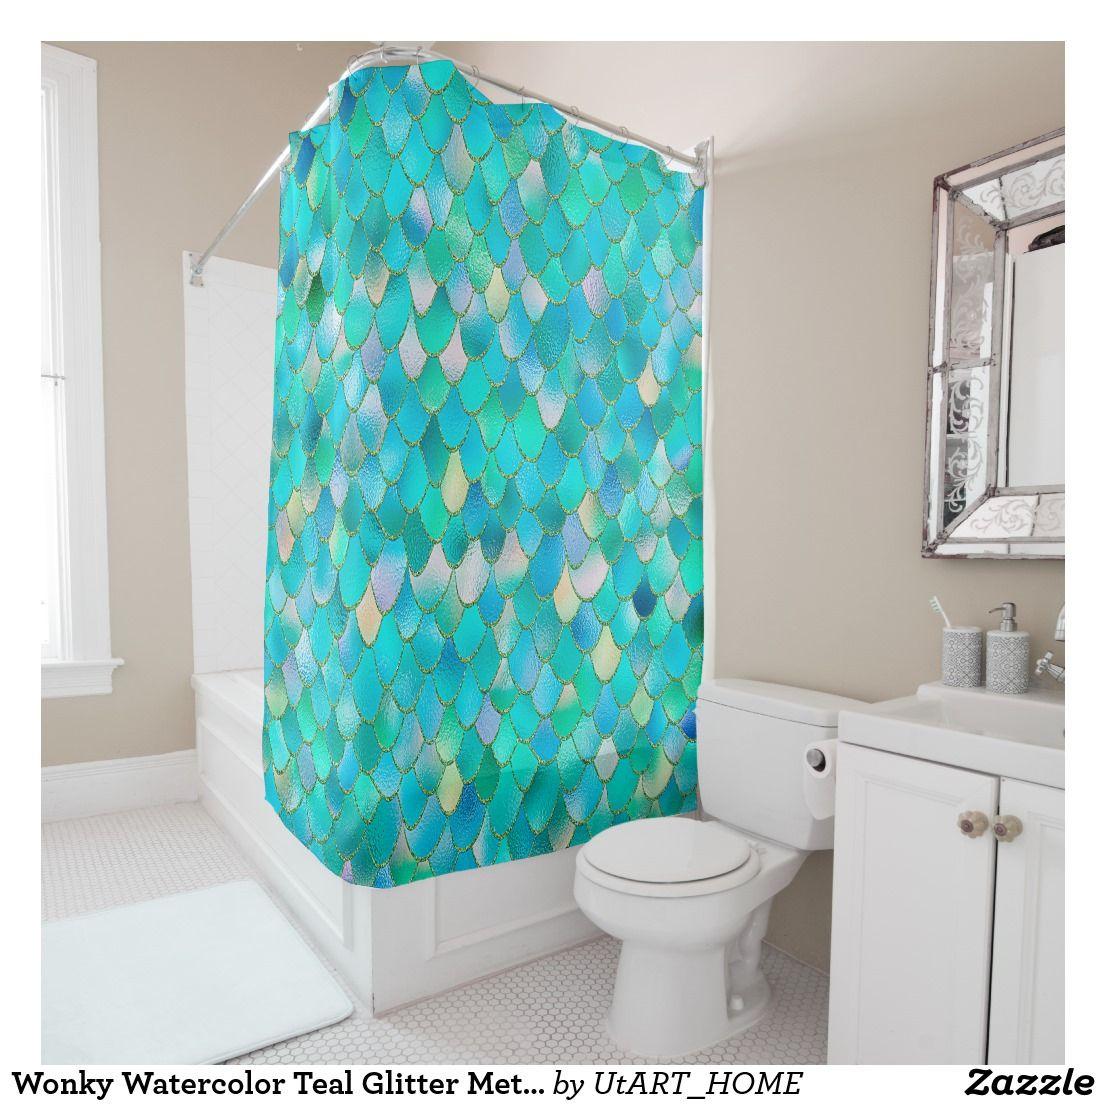 Wonky Watercolor Teal Glitter Metal Mermaid Scales Shower Curtain